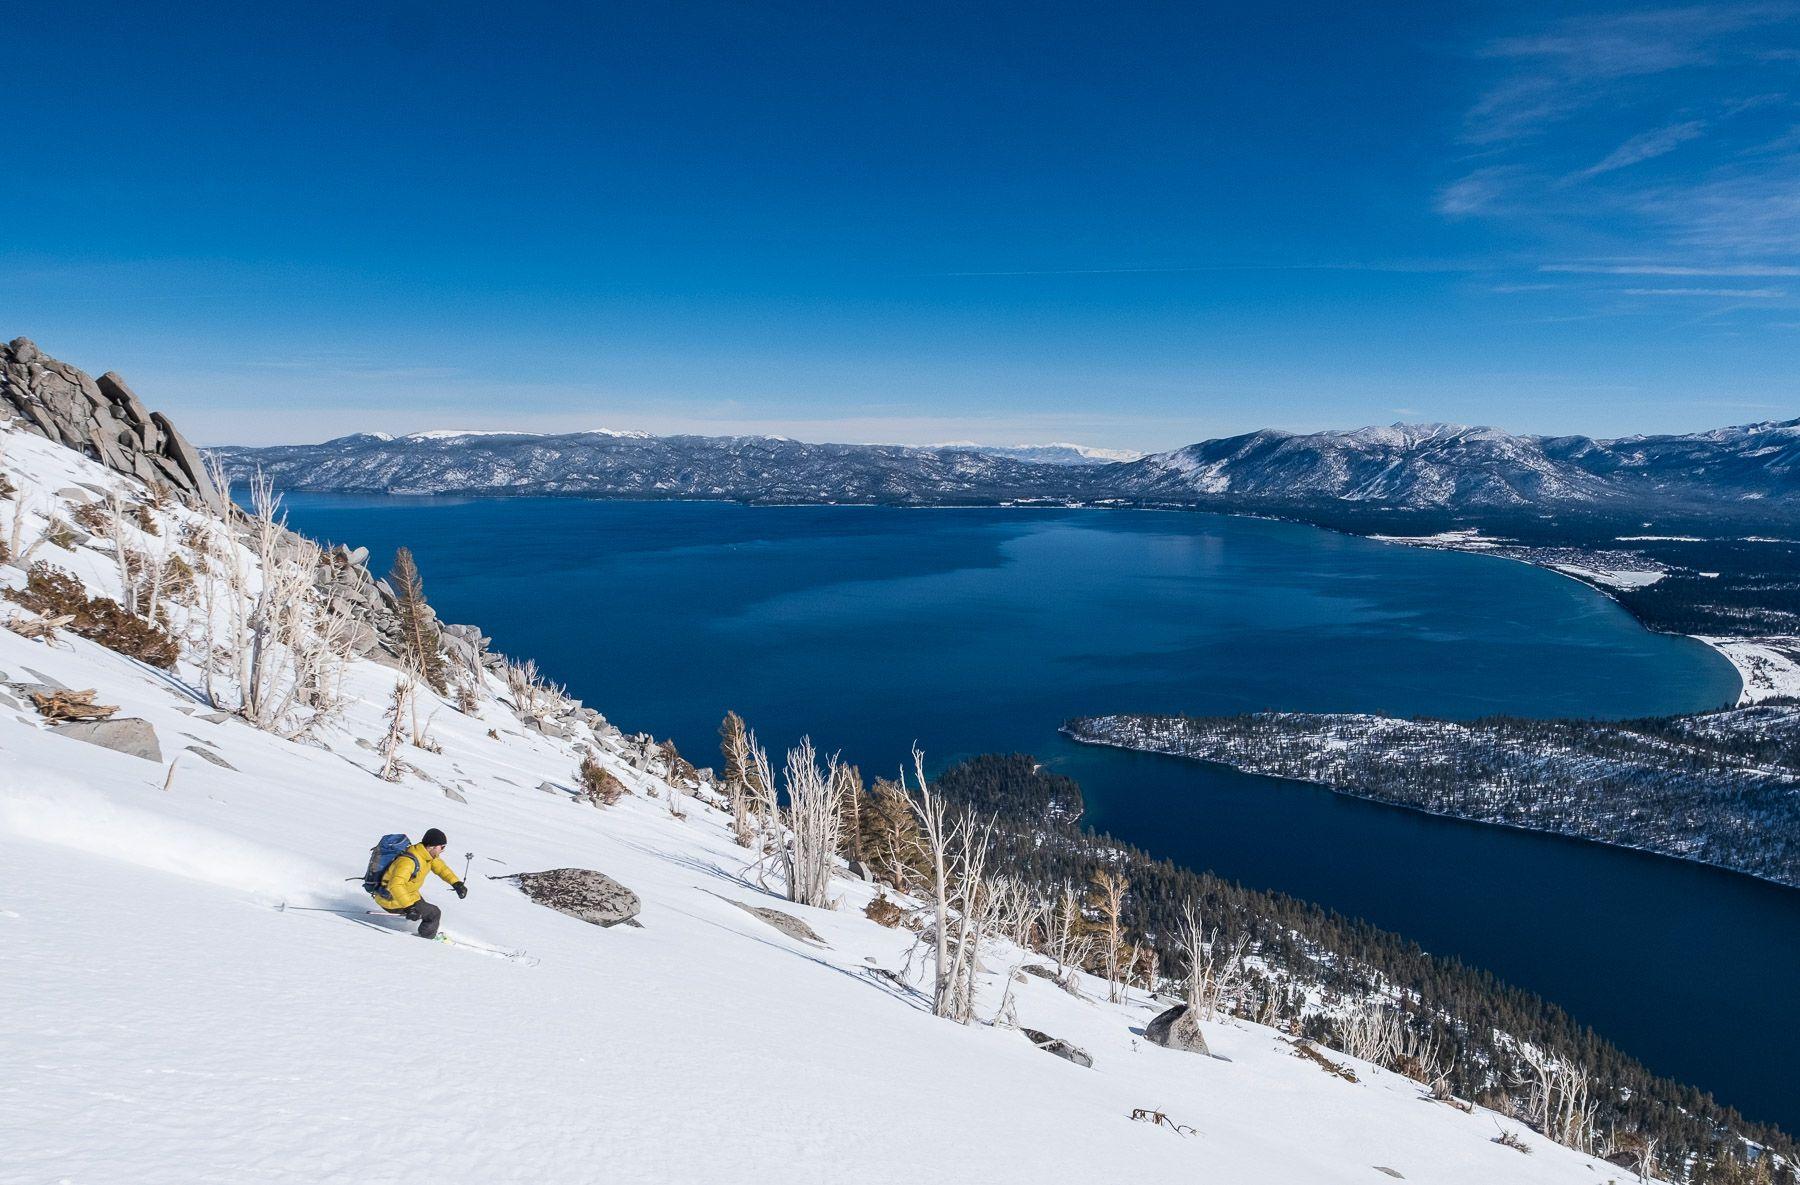 Backcountry skiing above lake Tahoe